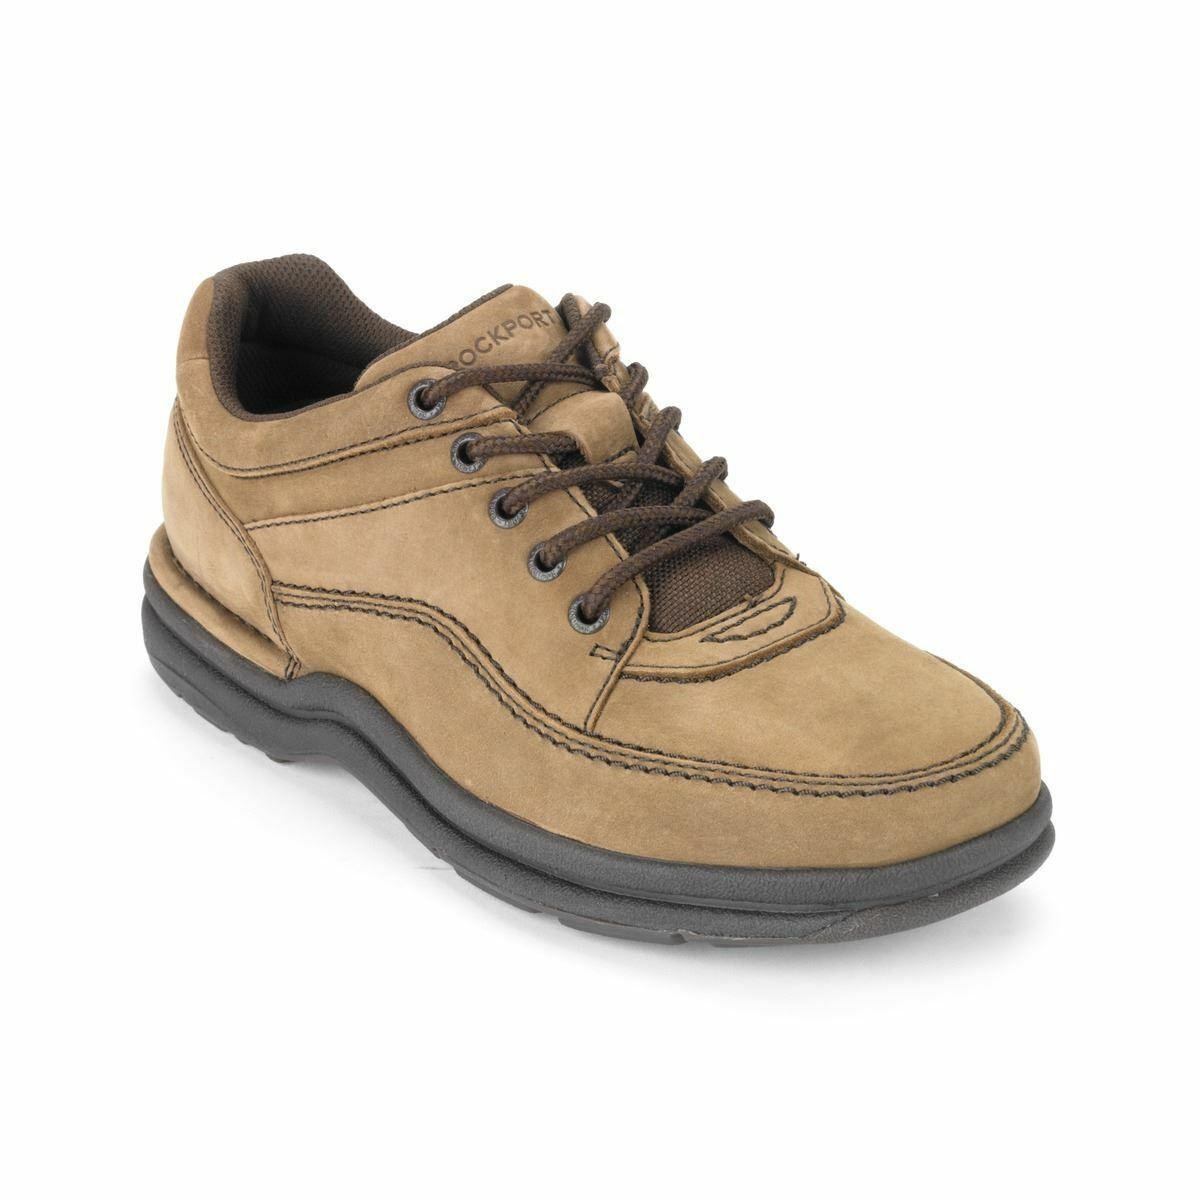 Rockport Rockport Rockport Herren Klassisch Schokolade Nubukleder Oxford Schuhe K71181  8cdcca